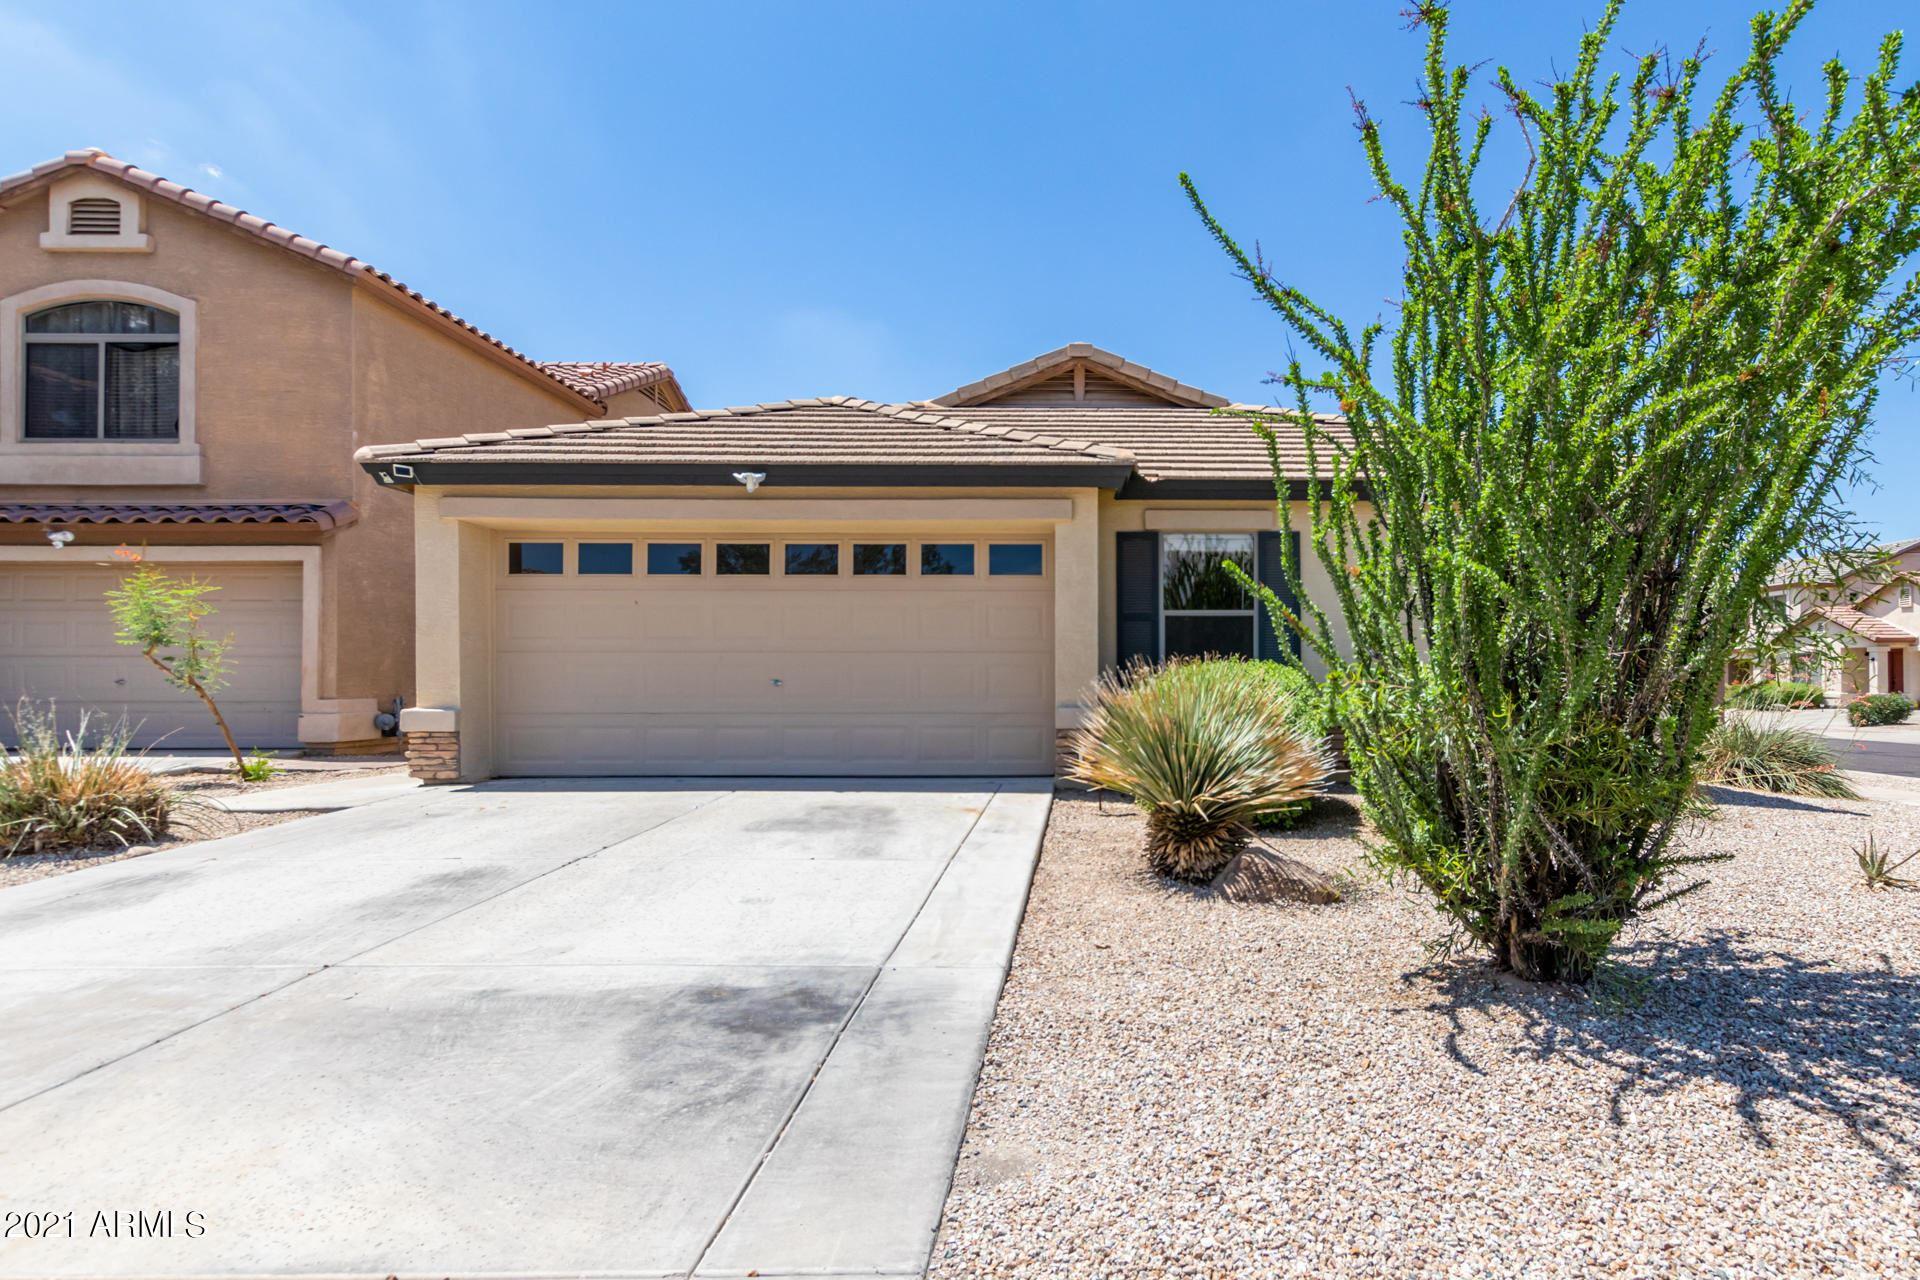 Photo of 8702 S 50TH Drive, Laveen, AZ 85339 (MLS # 6270855)